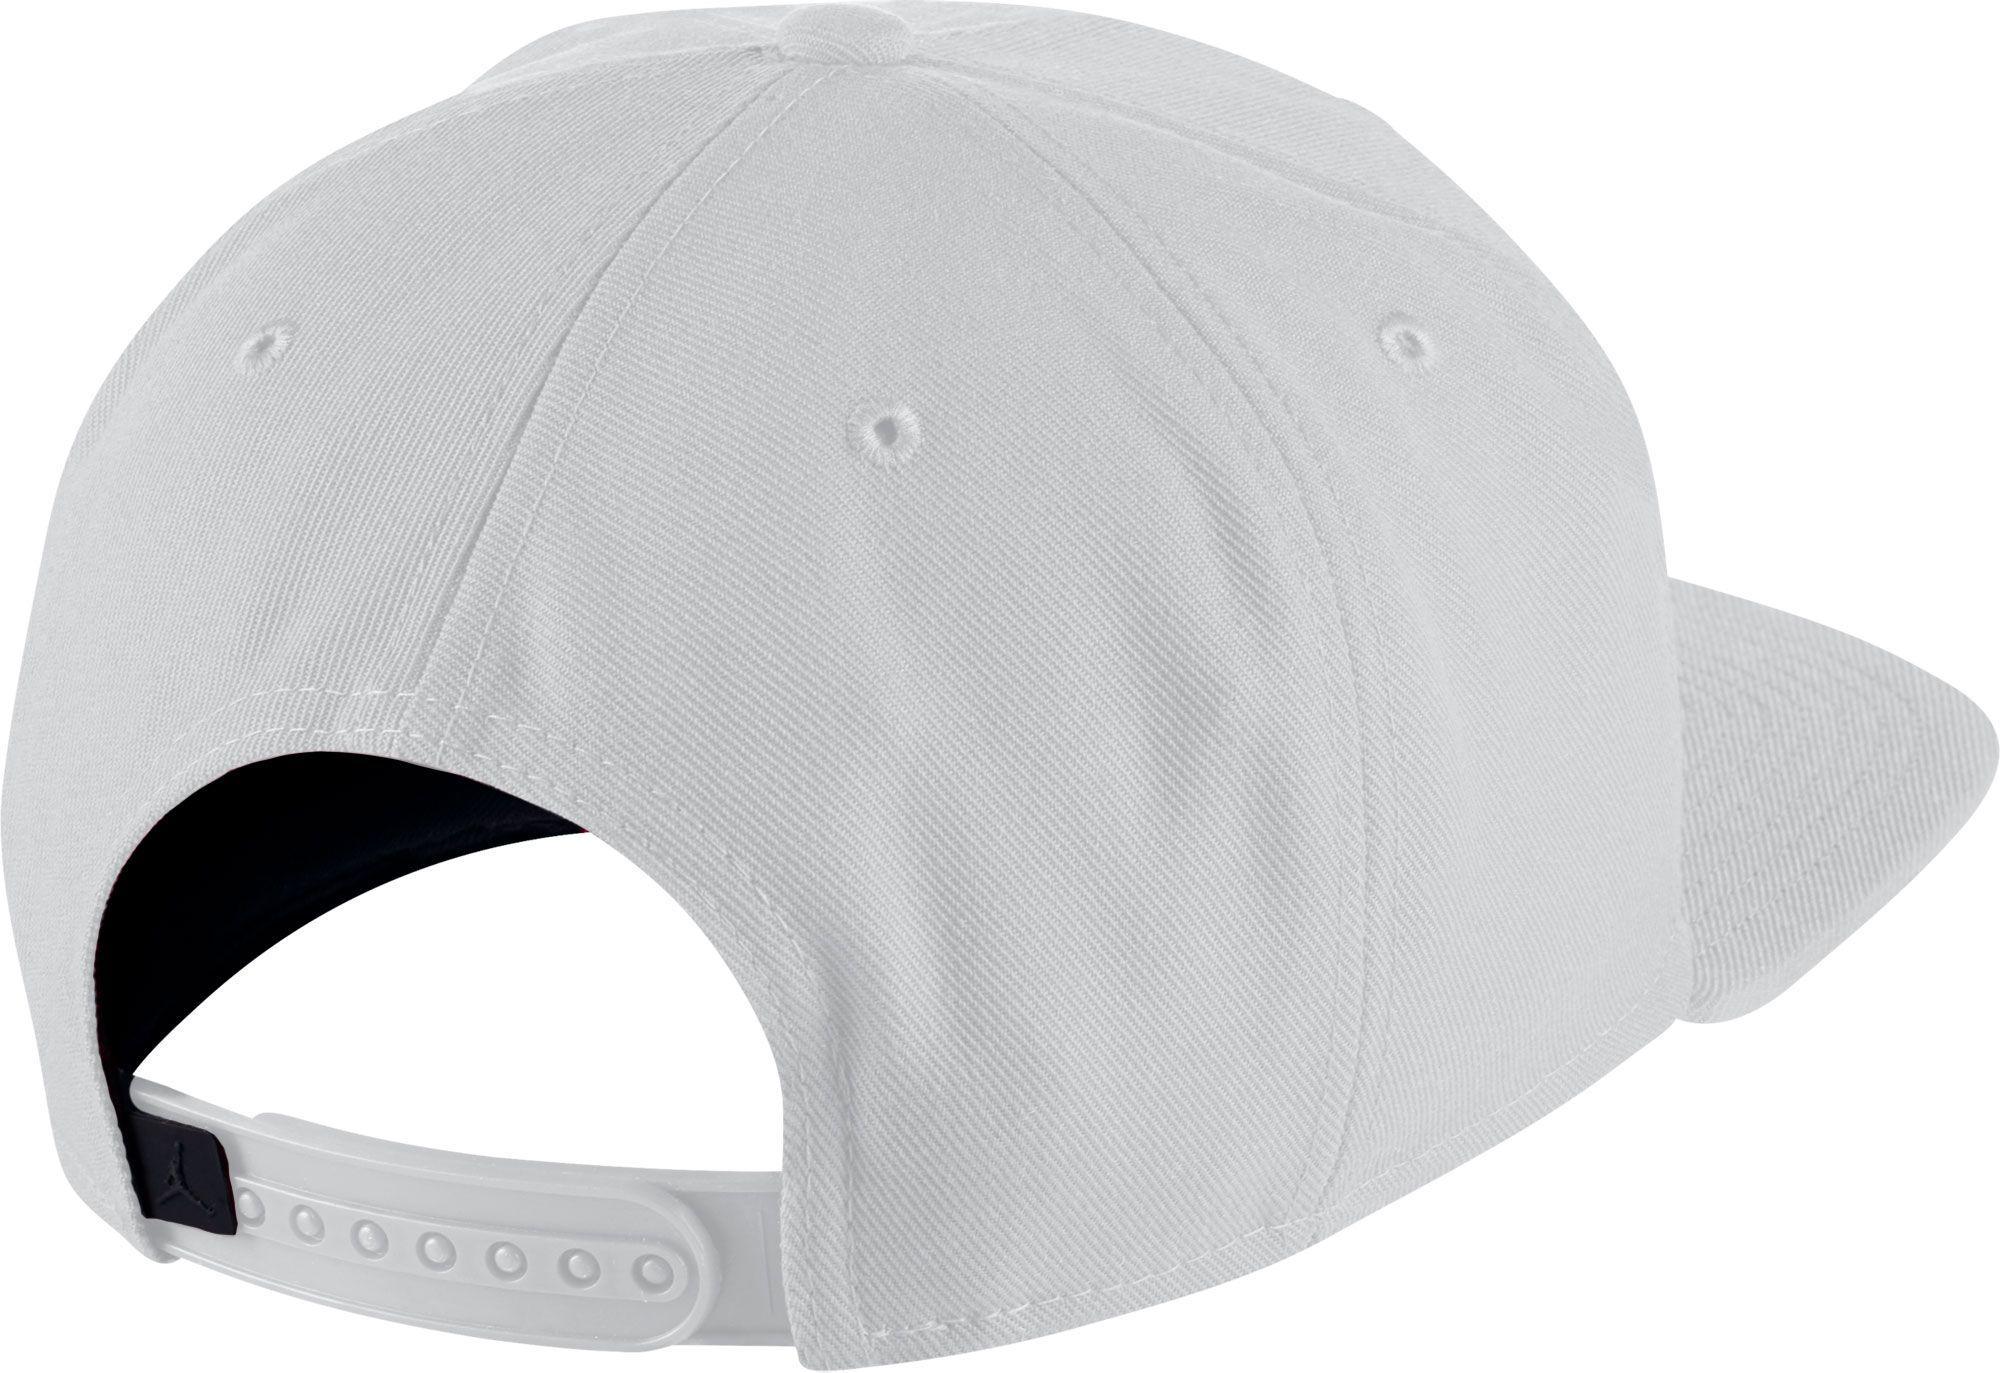 55ccfea25b41 Lyst - Nike Pro Re2pect Adjustable Hat in White for Men